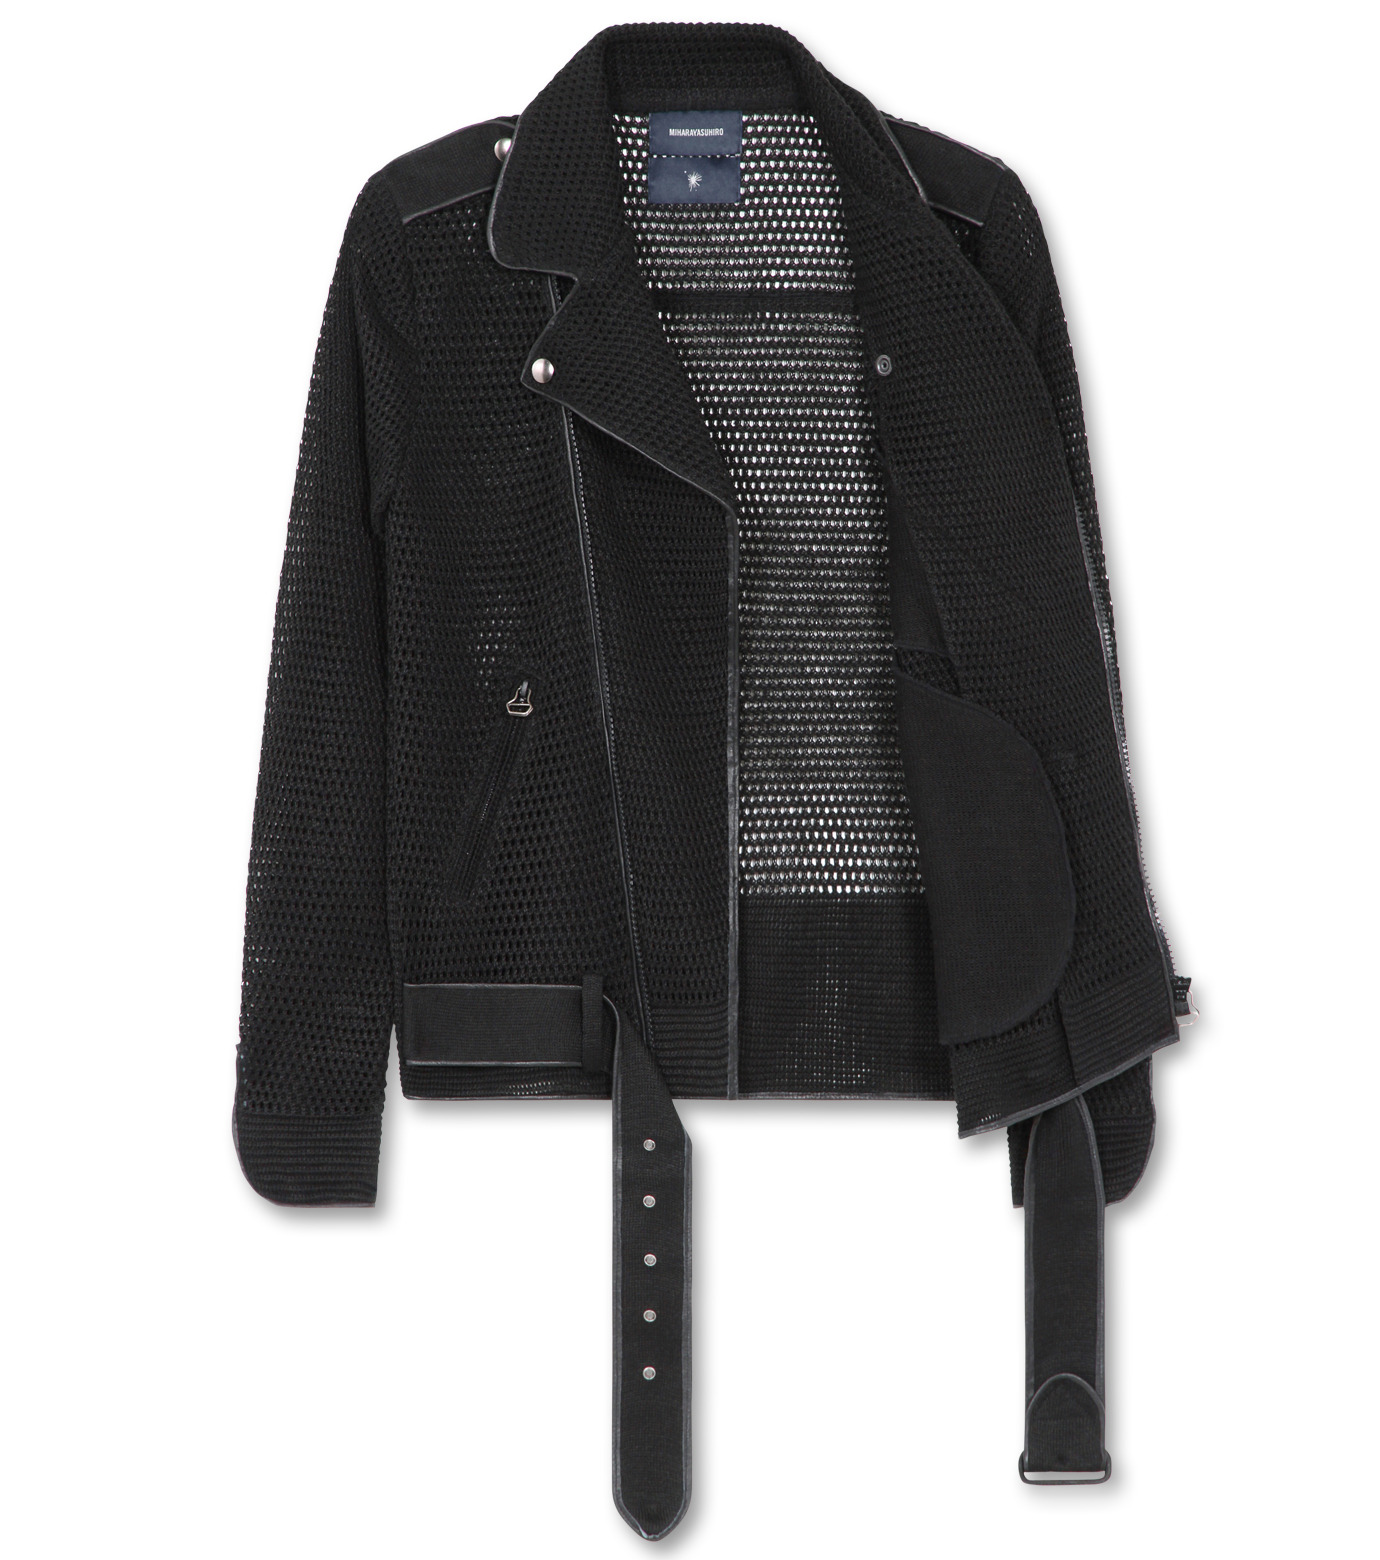 Miharayasuhiro(ミハラヤスヒロ)のLinen knit riders jacket-BLACK-9150-3537-13 拡大詳細画像2